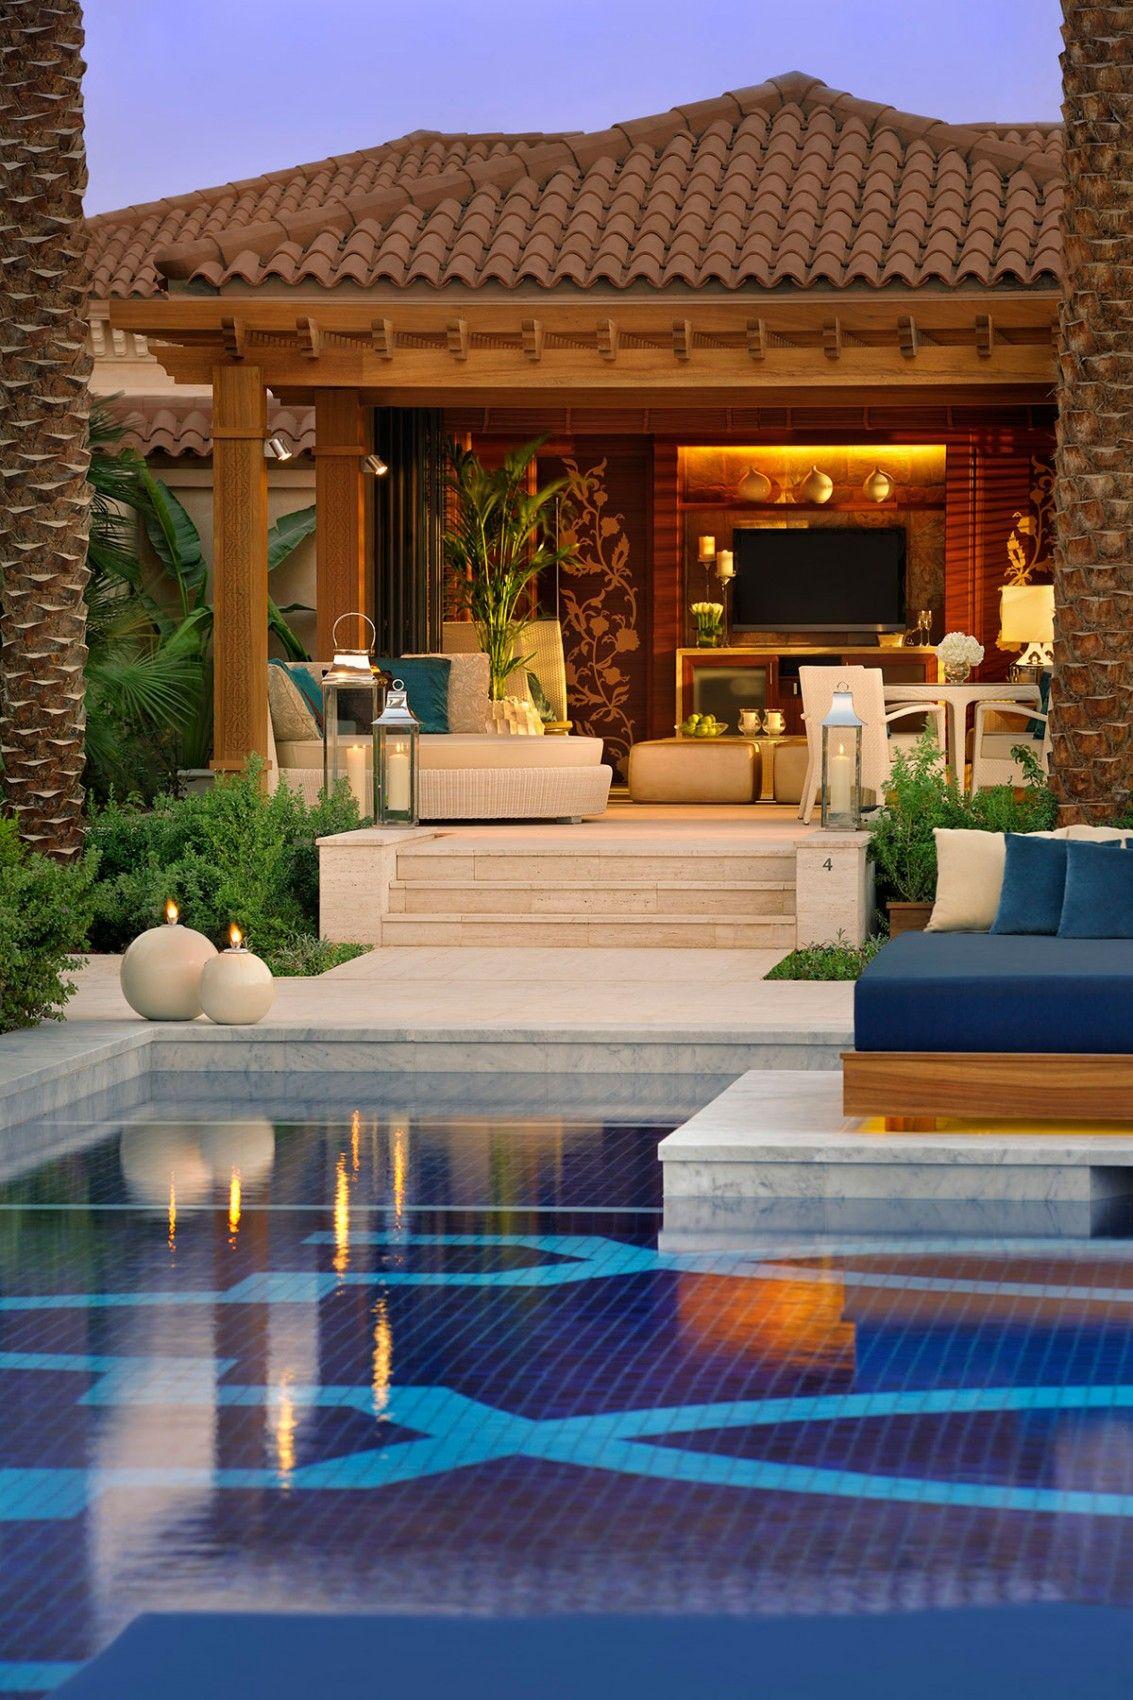 Paradise at home | Your Dream Home | Pinterest | Reisen, Natur und ...